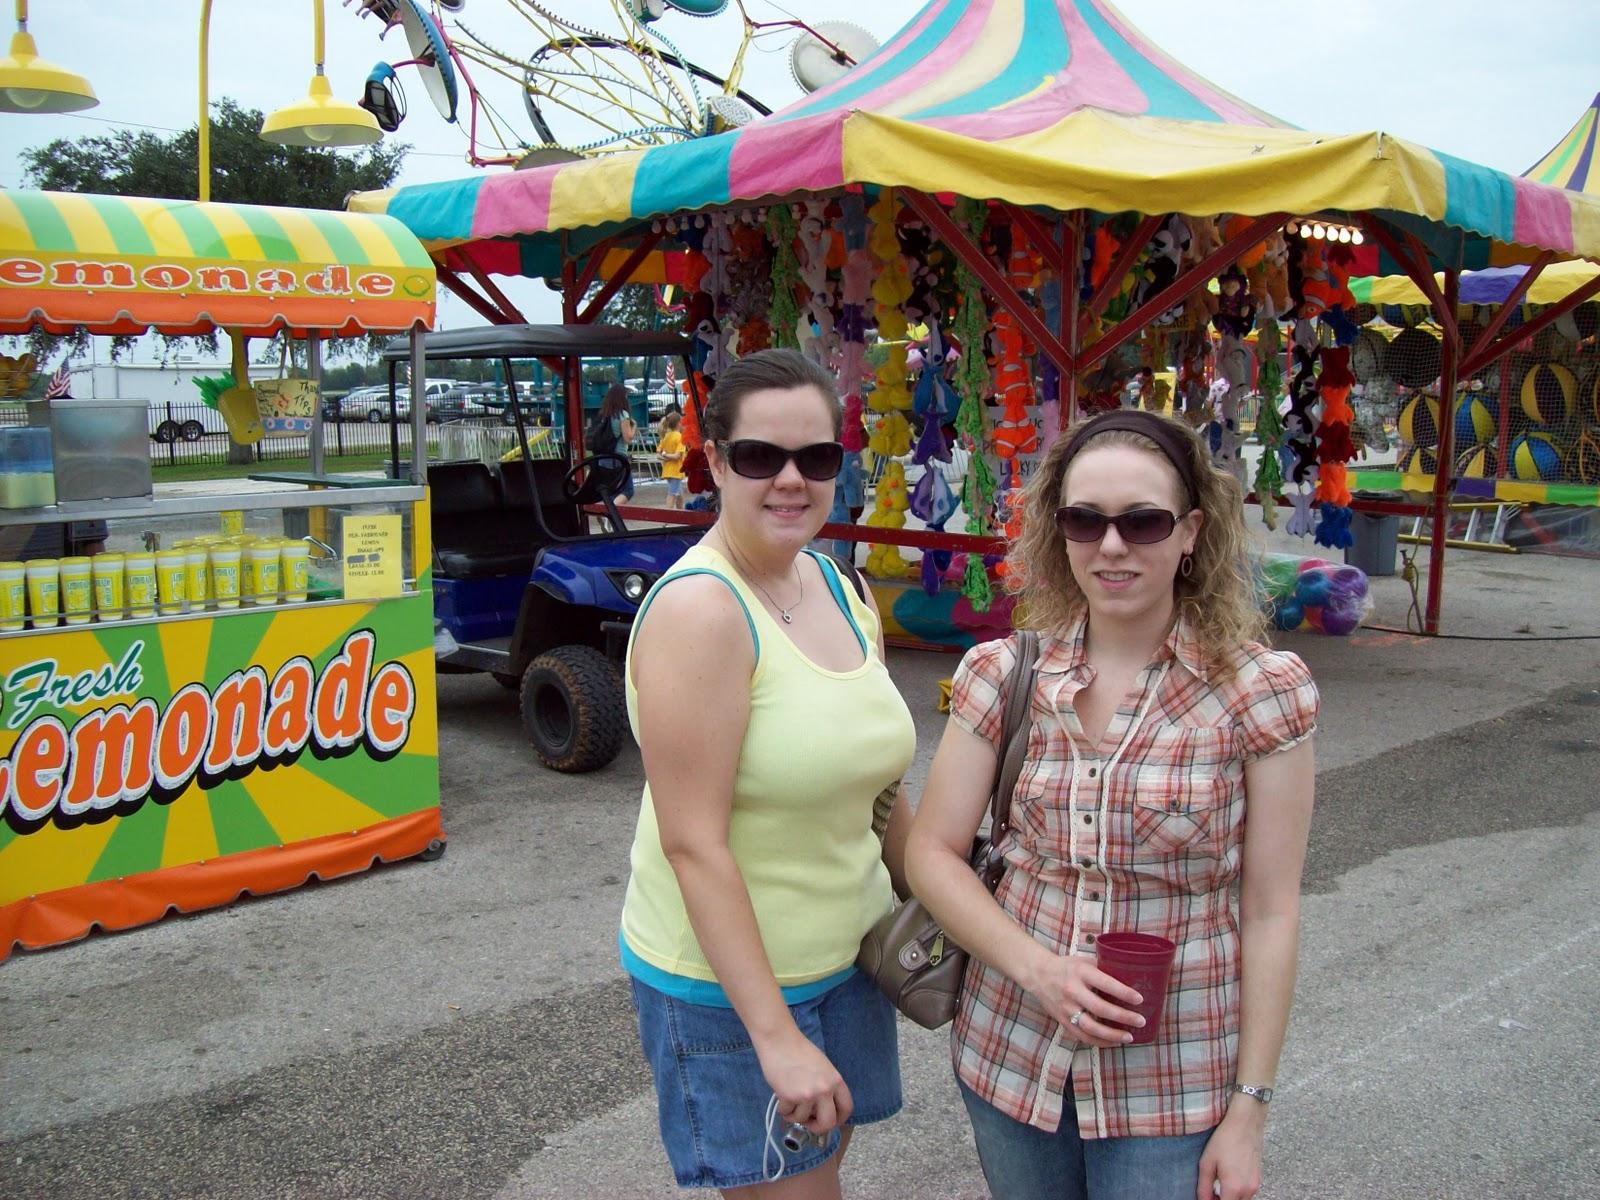 Fort Bend County Fair - 101_5569.JPG